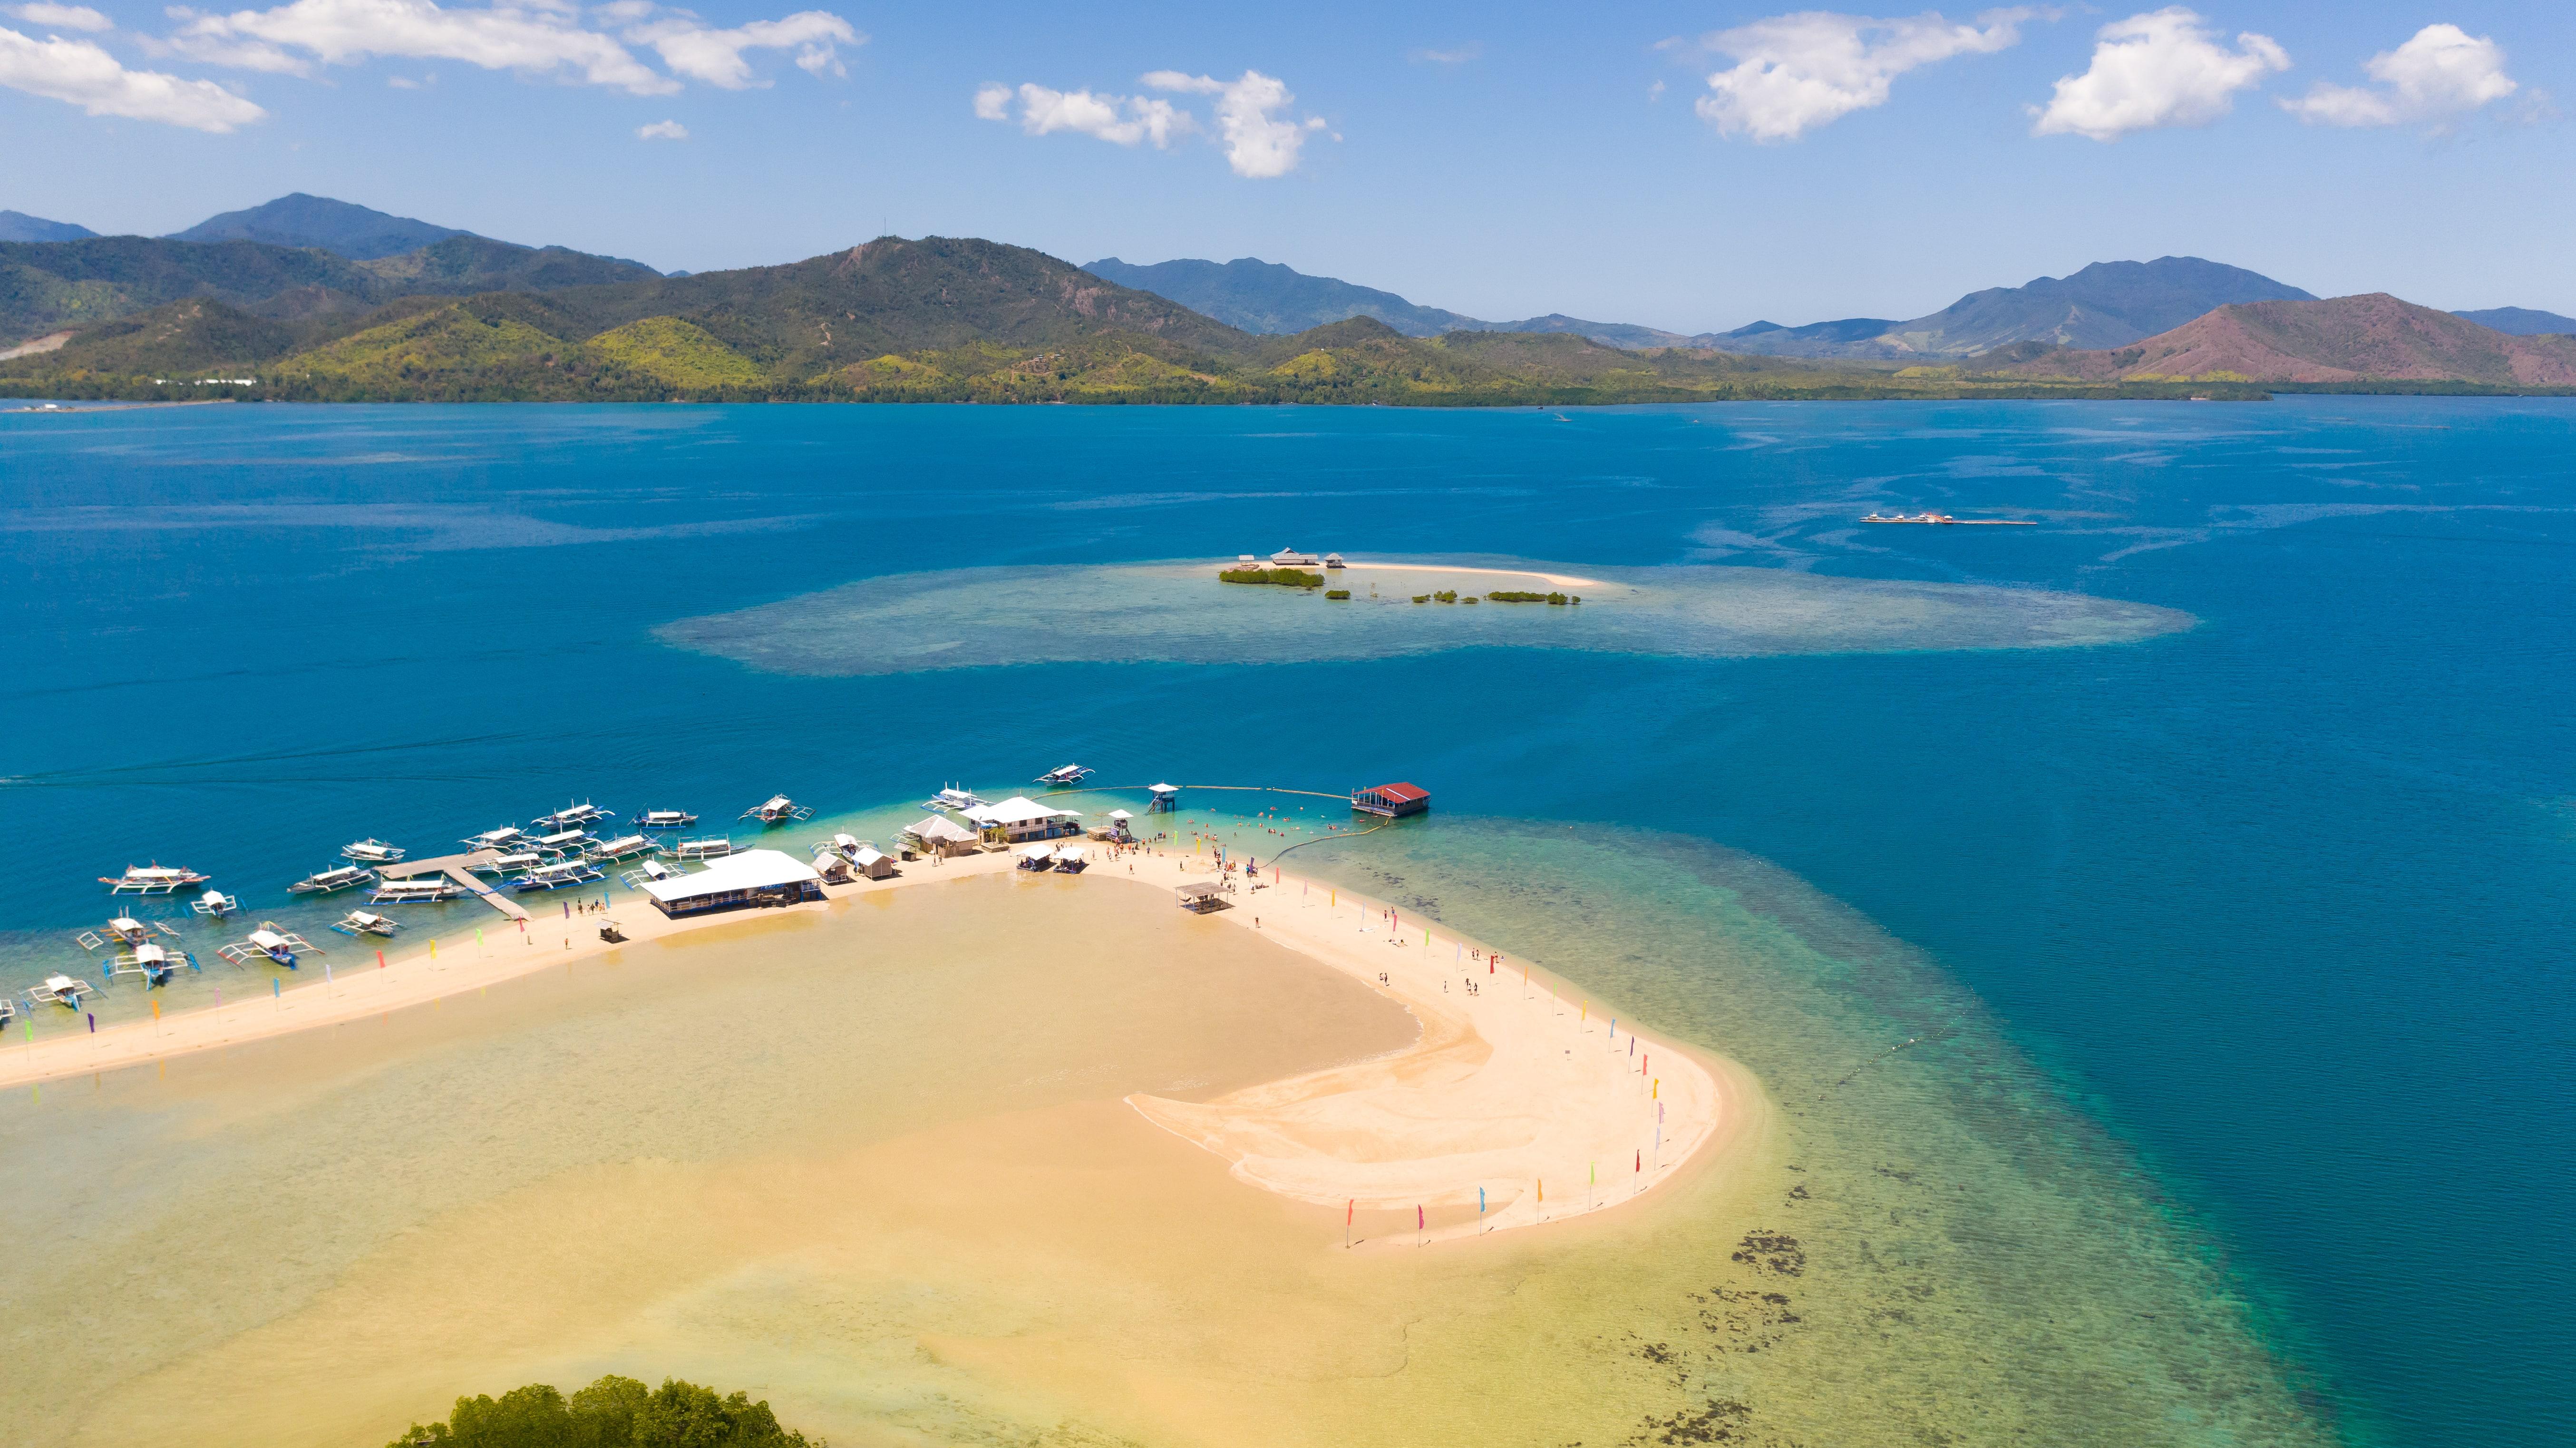 Aerial view of Luli Island in Palawan